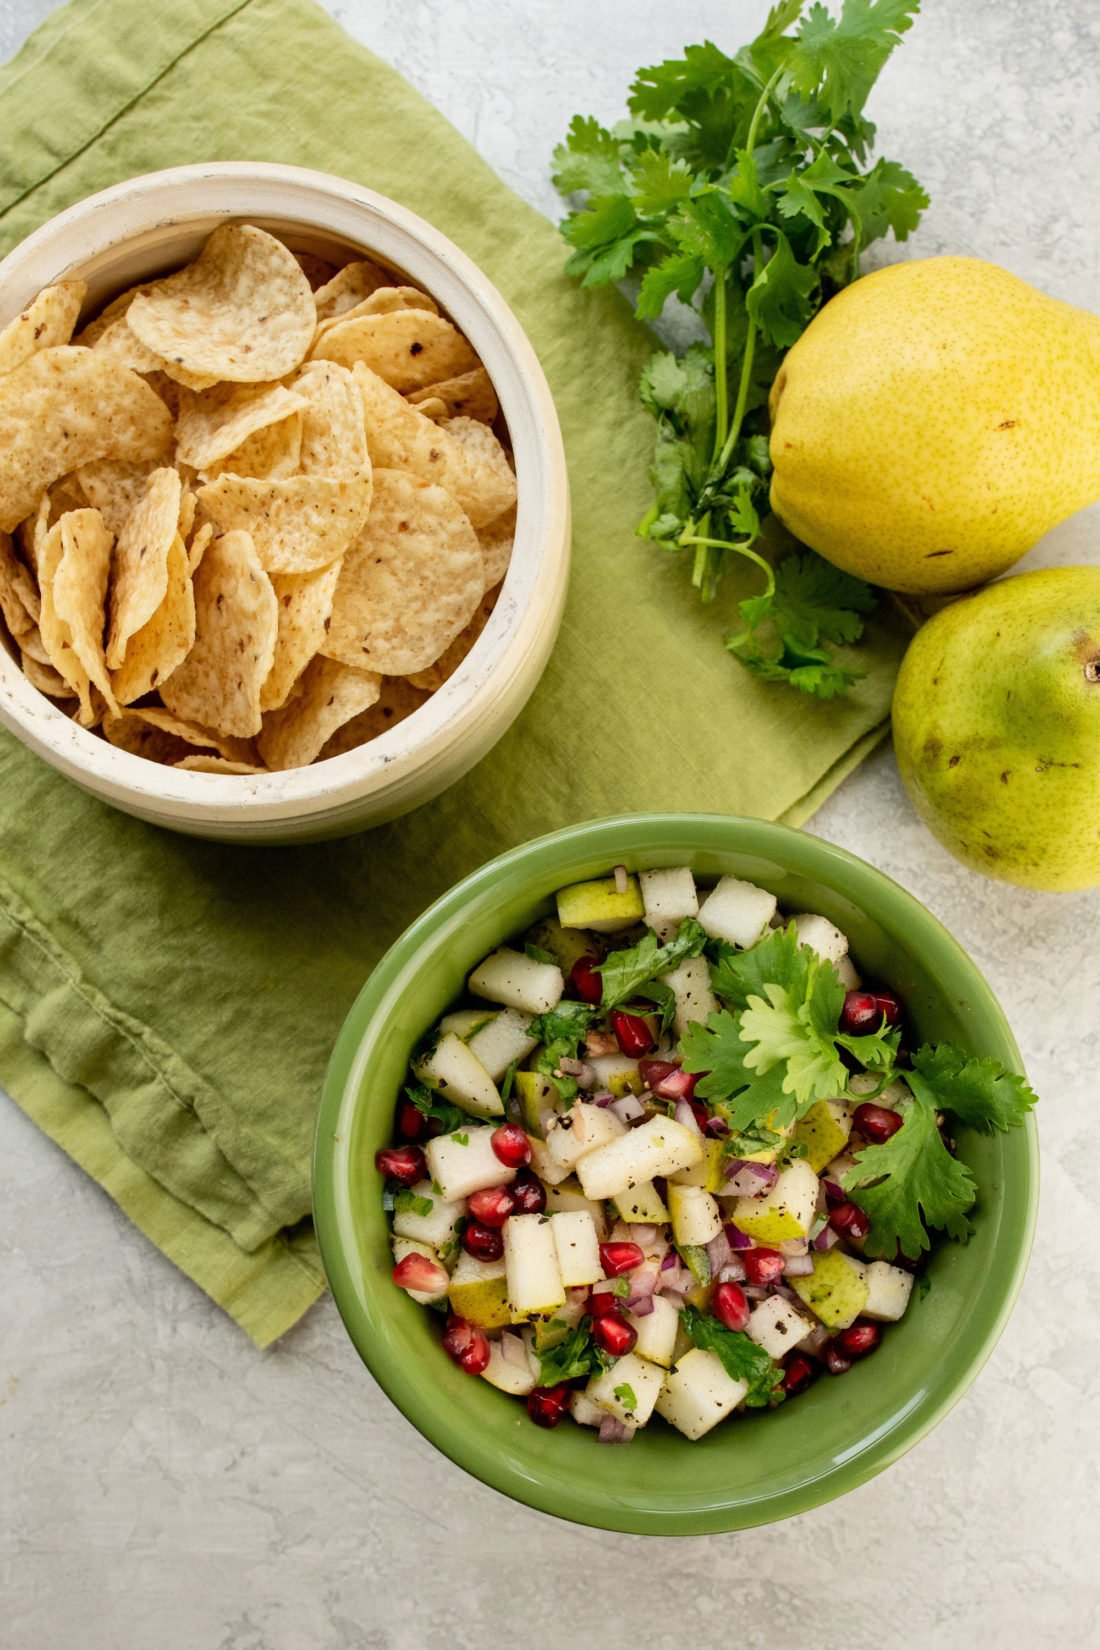 Spicy Pear and Cilantro Salsa / Photo by Cheyenne Cohen / Katie Workman / themom100.com